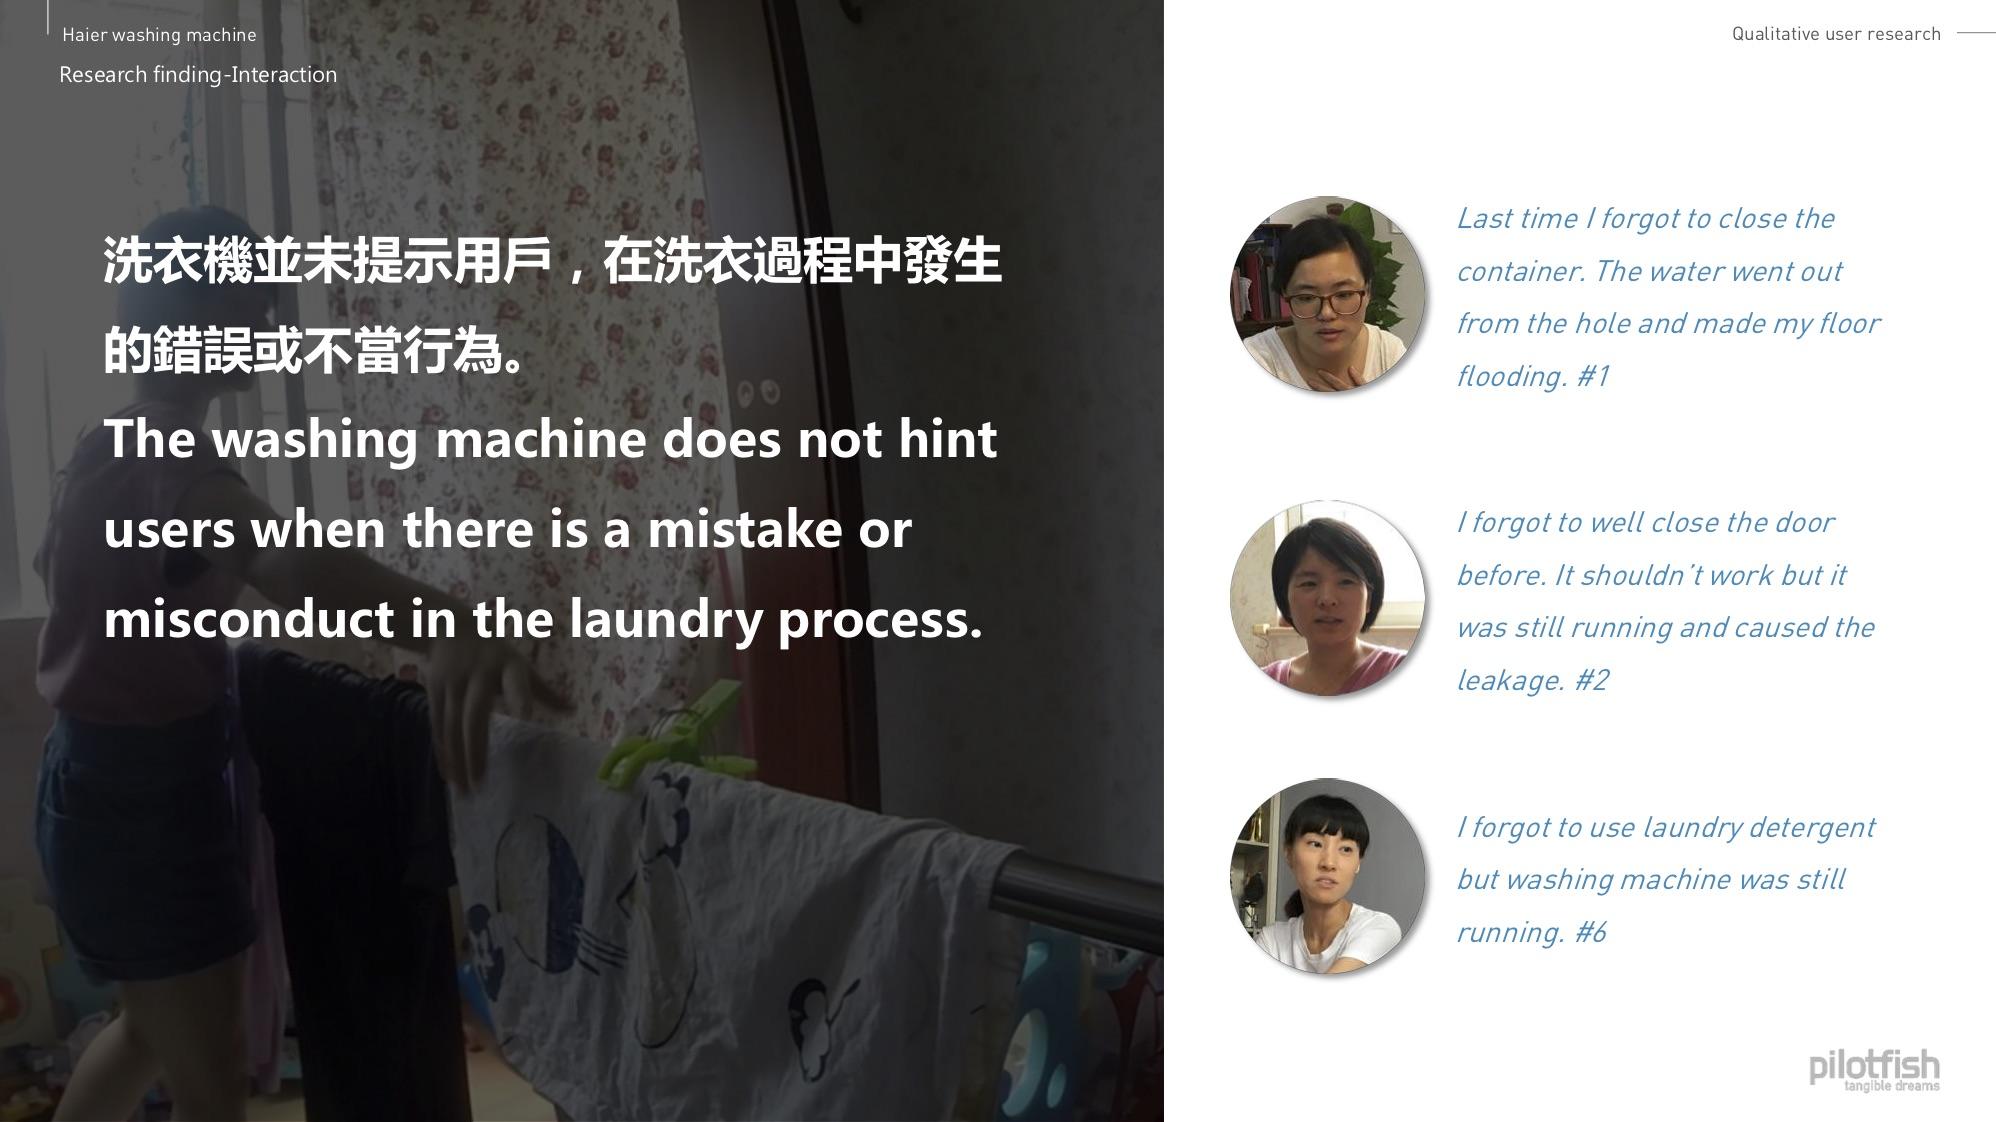 20170727_Haier_washing machine innovative UI_P0 presentation_V4_Eng_25.jpg